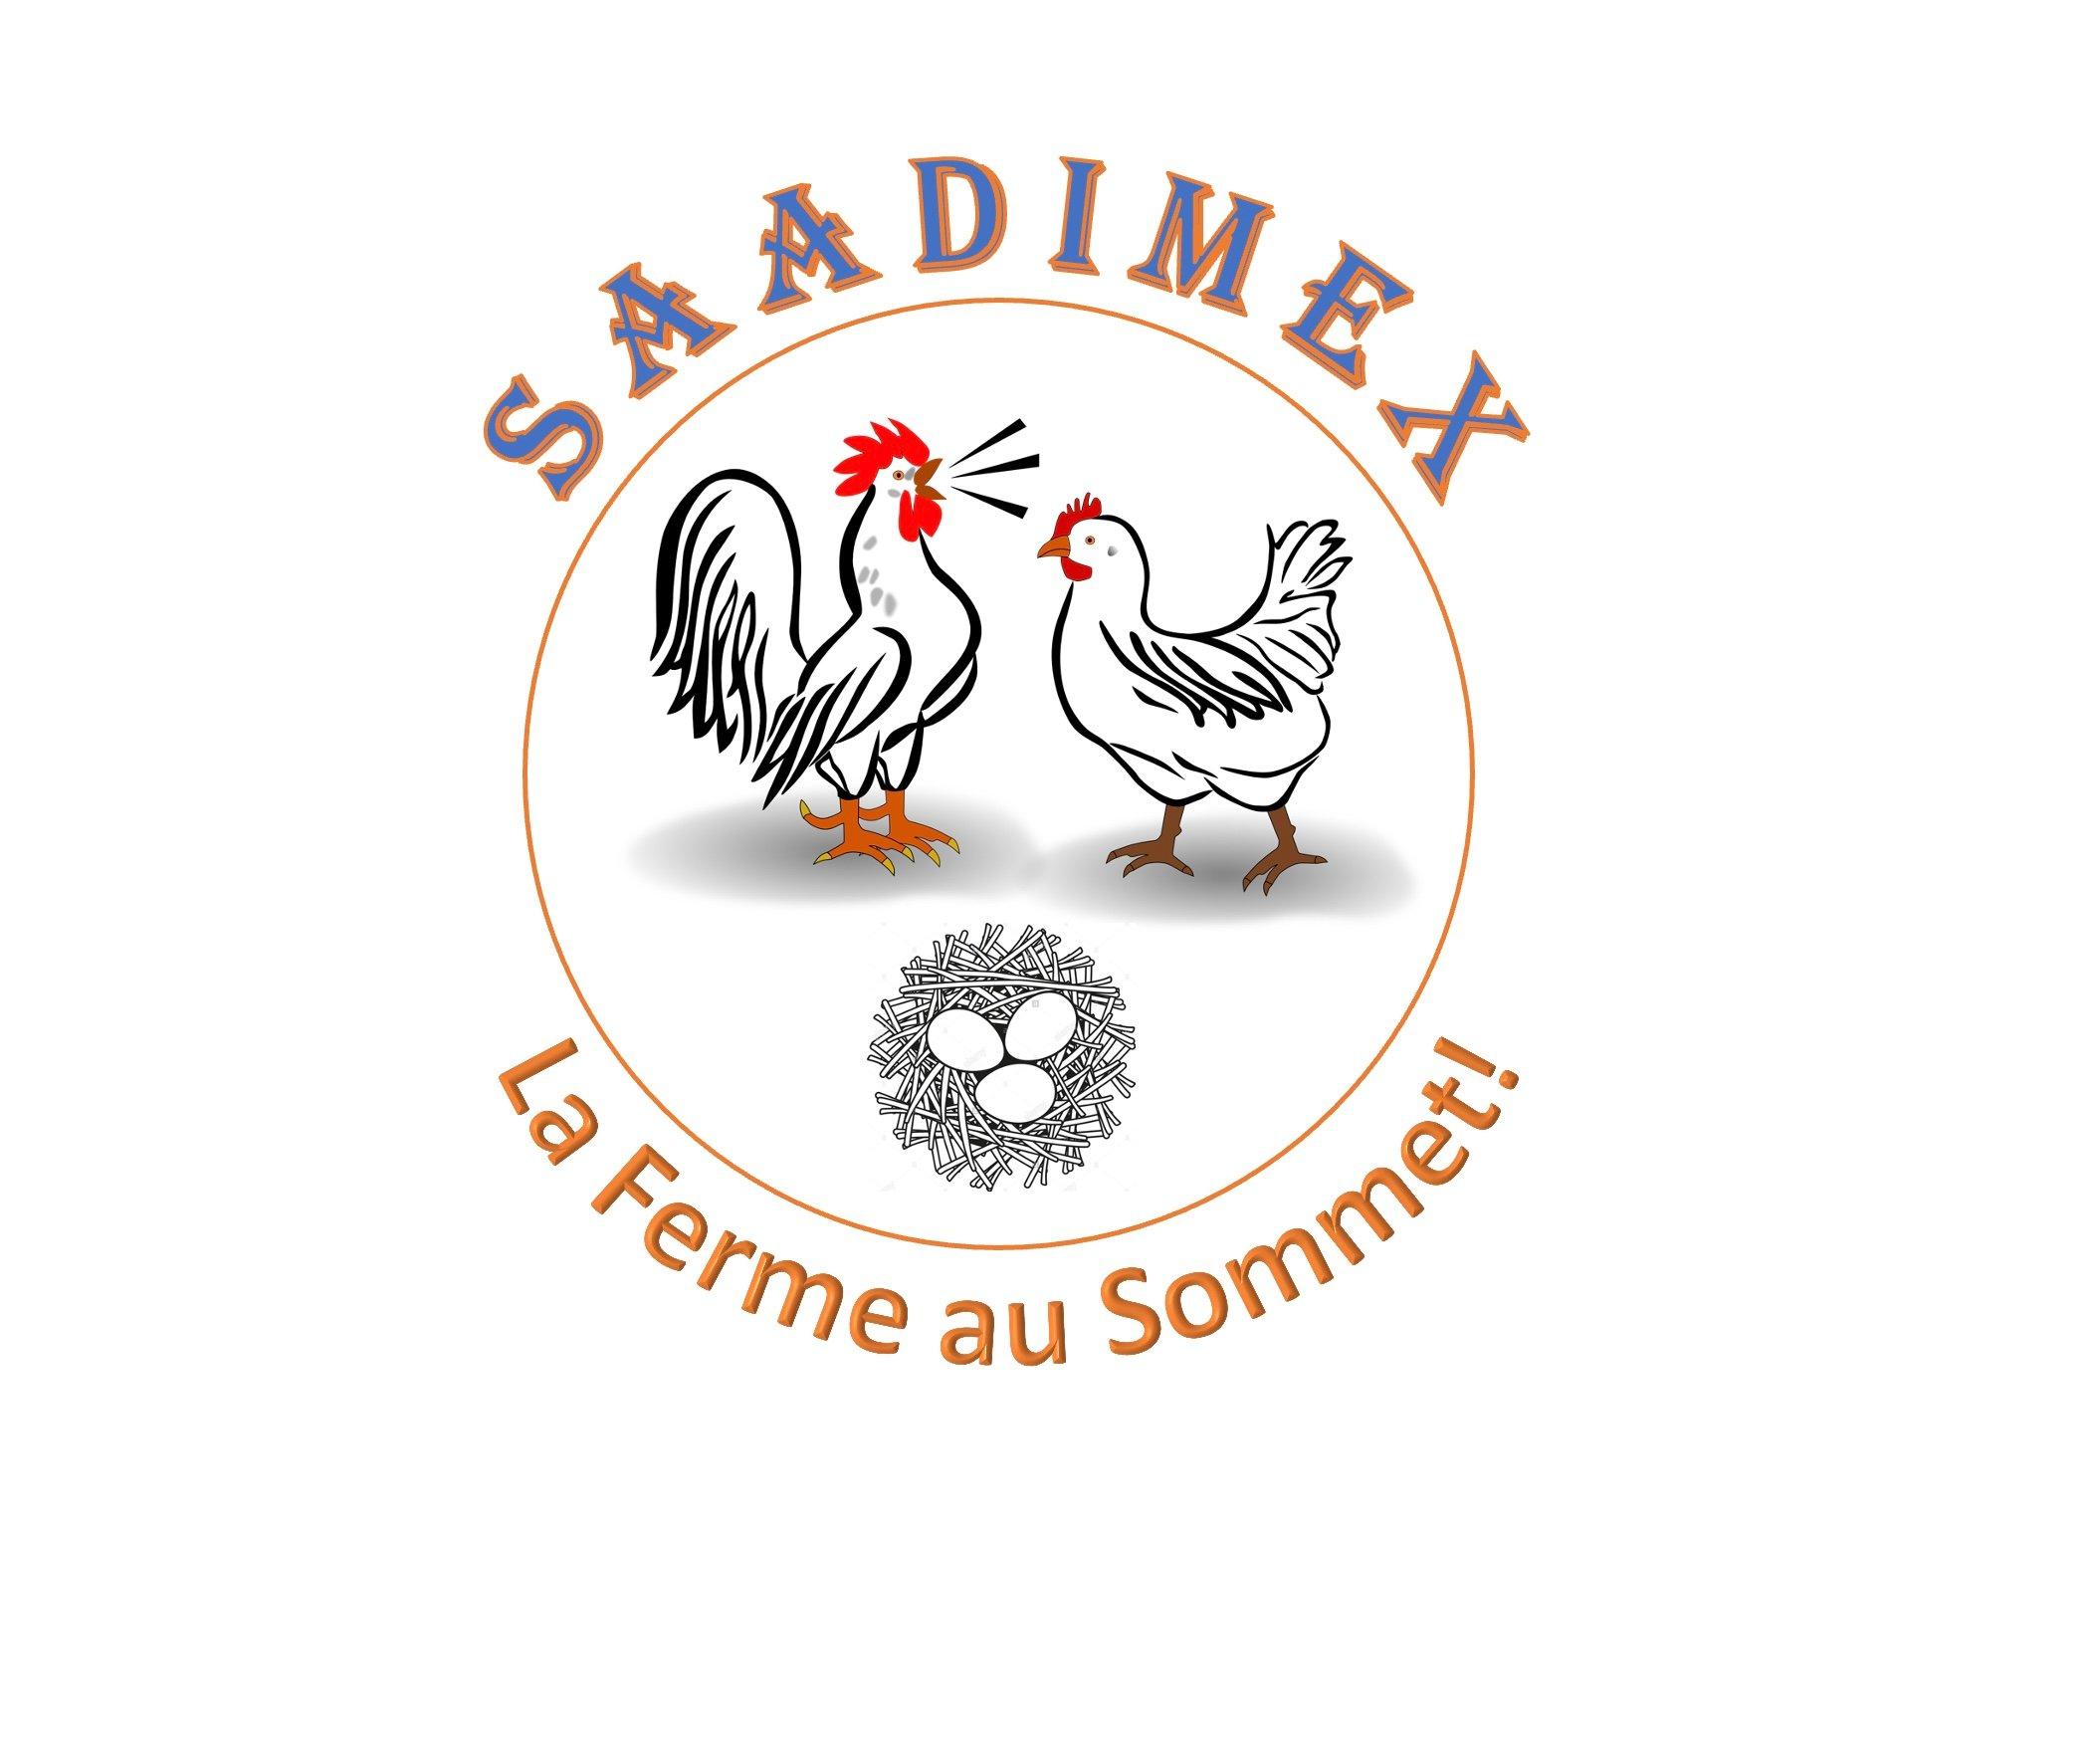 www.saadimexsn.com